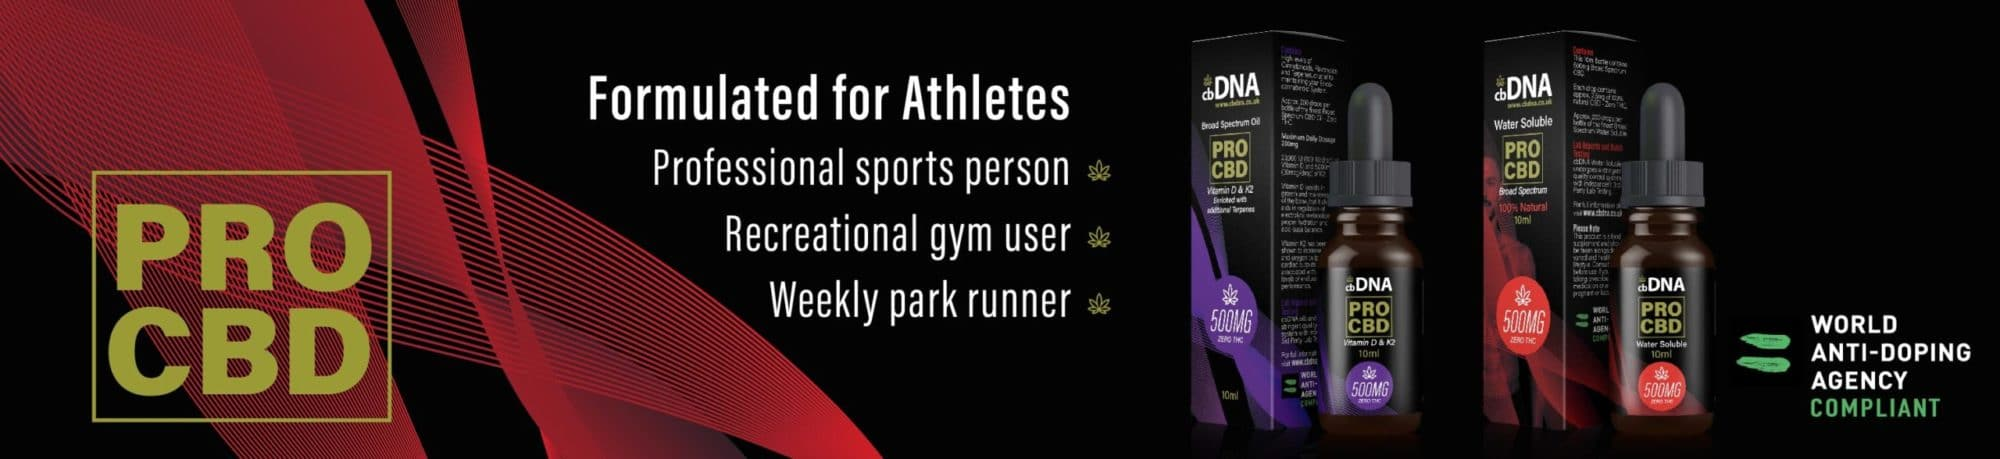 CBD Gym Fitness Oil